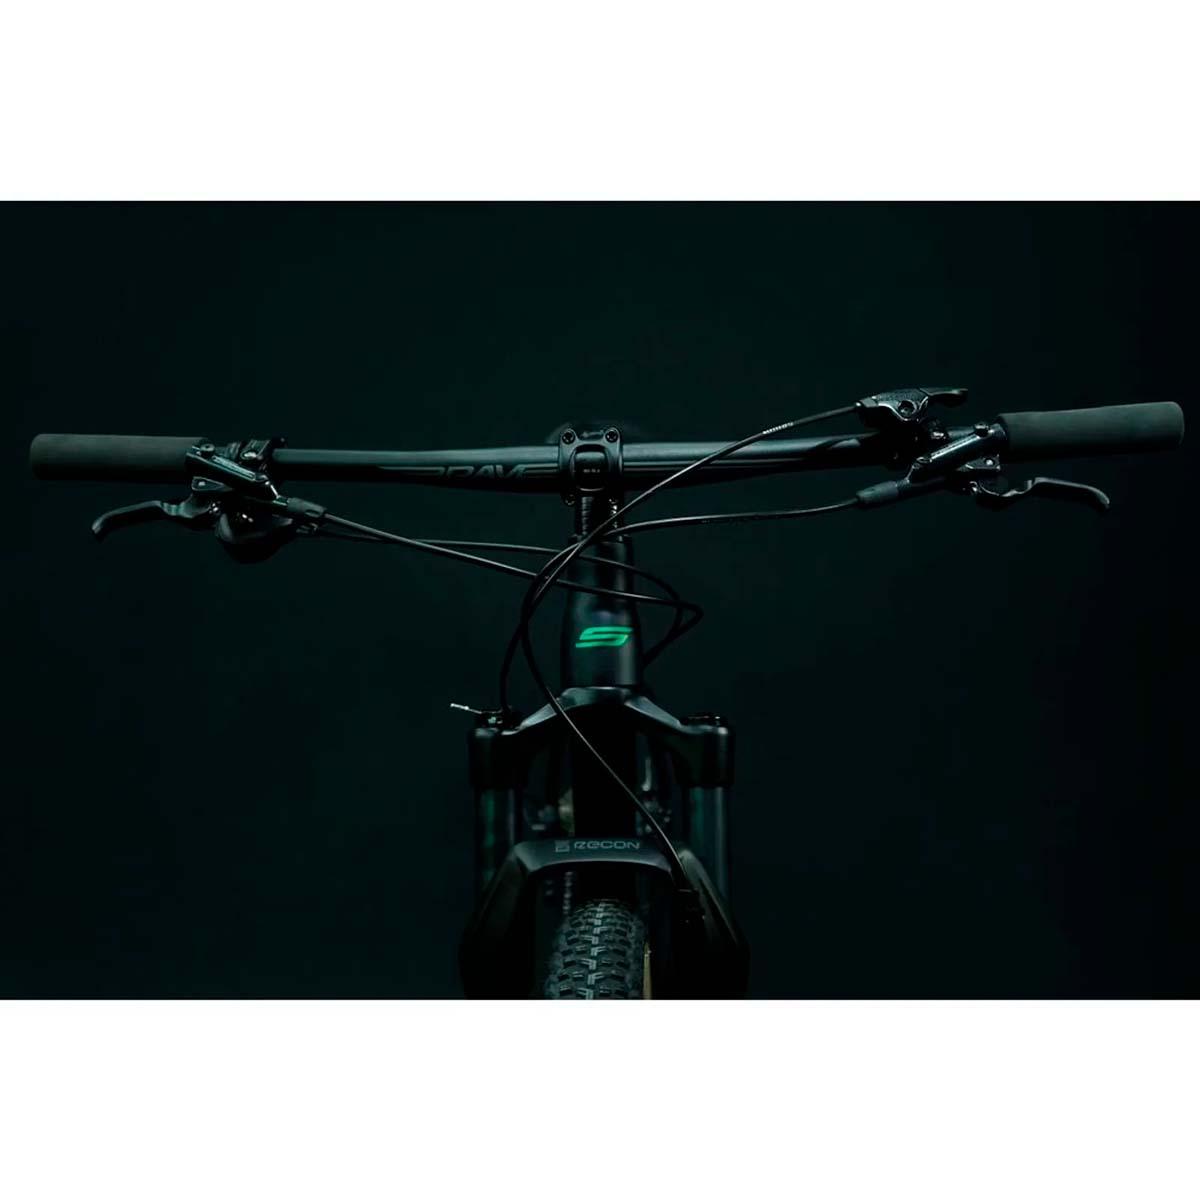 Bicicleta Soul SL 529 Aro 29 12V Sram NX Boost Degrade Verde e Turquesa 21